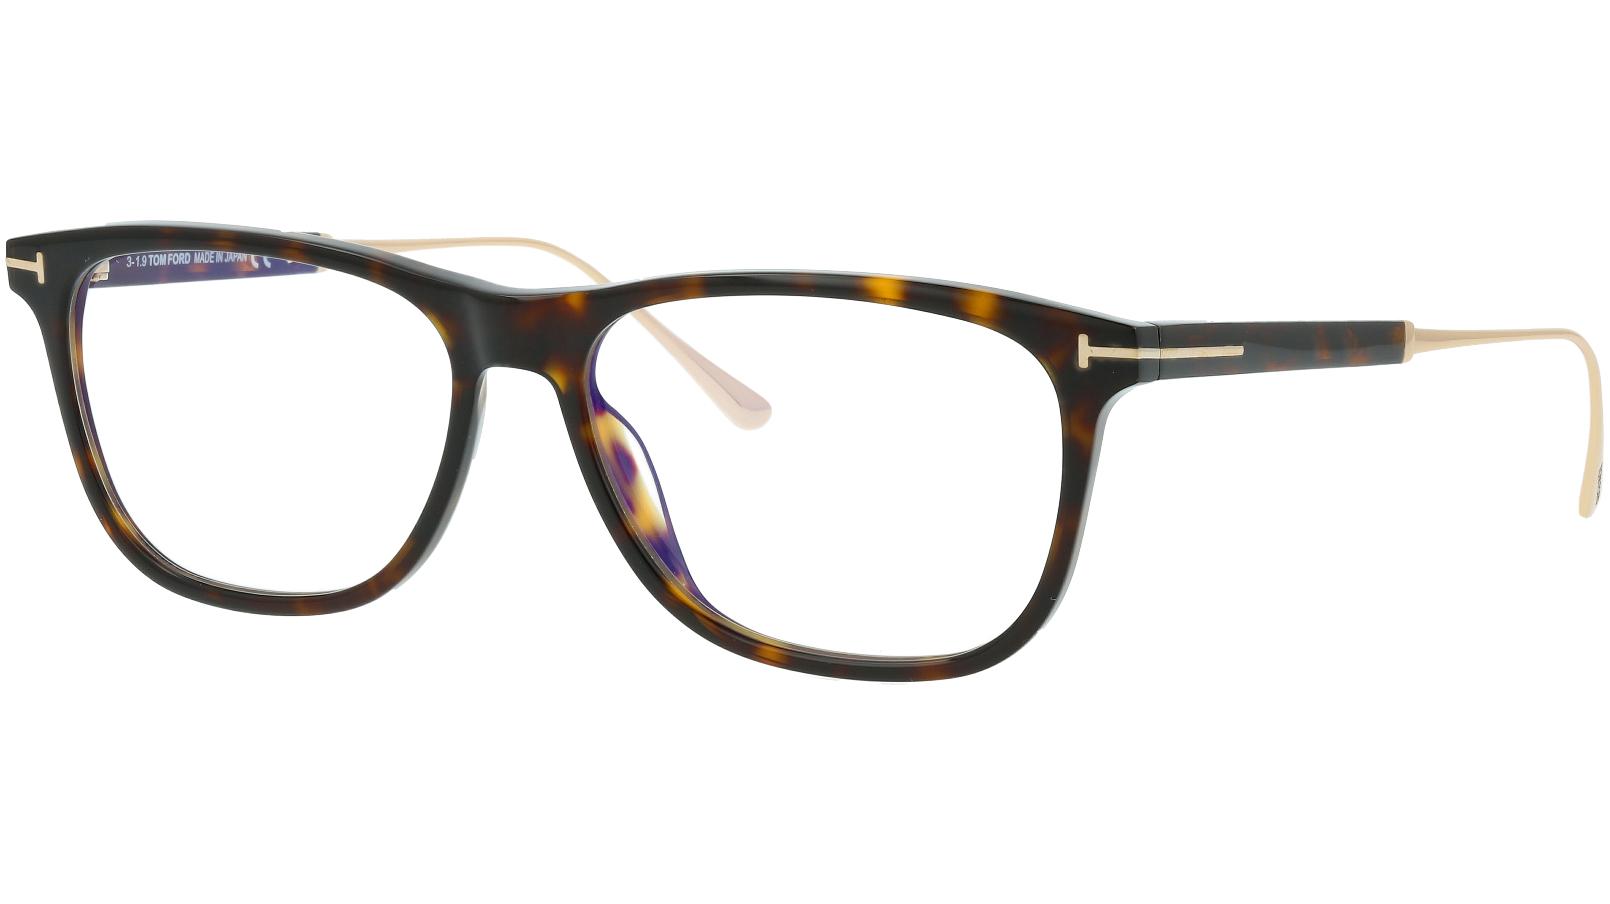 Tom Ford TF5589-B 052 55 Havana Glasses